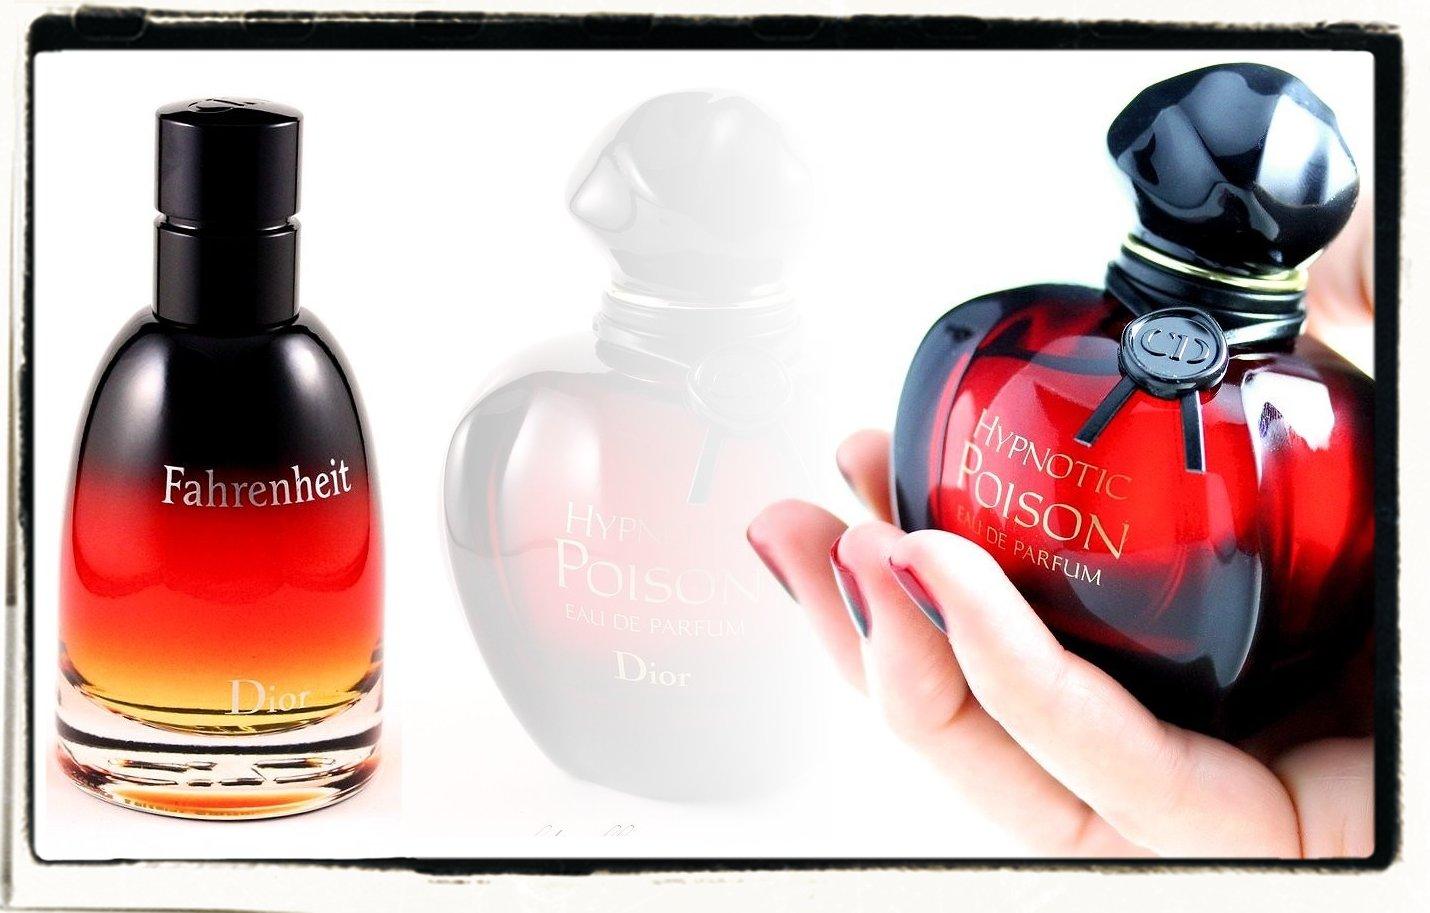 Parfum Fahrenheit Pas Cher